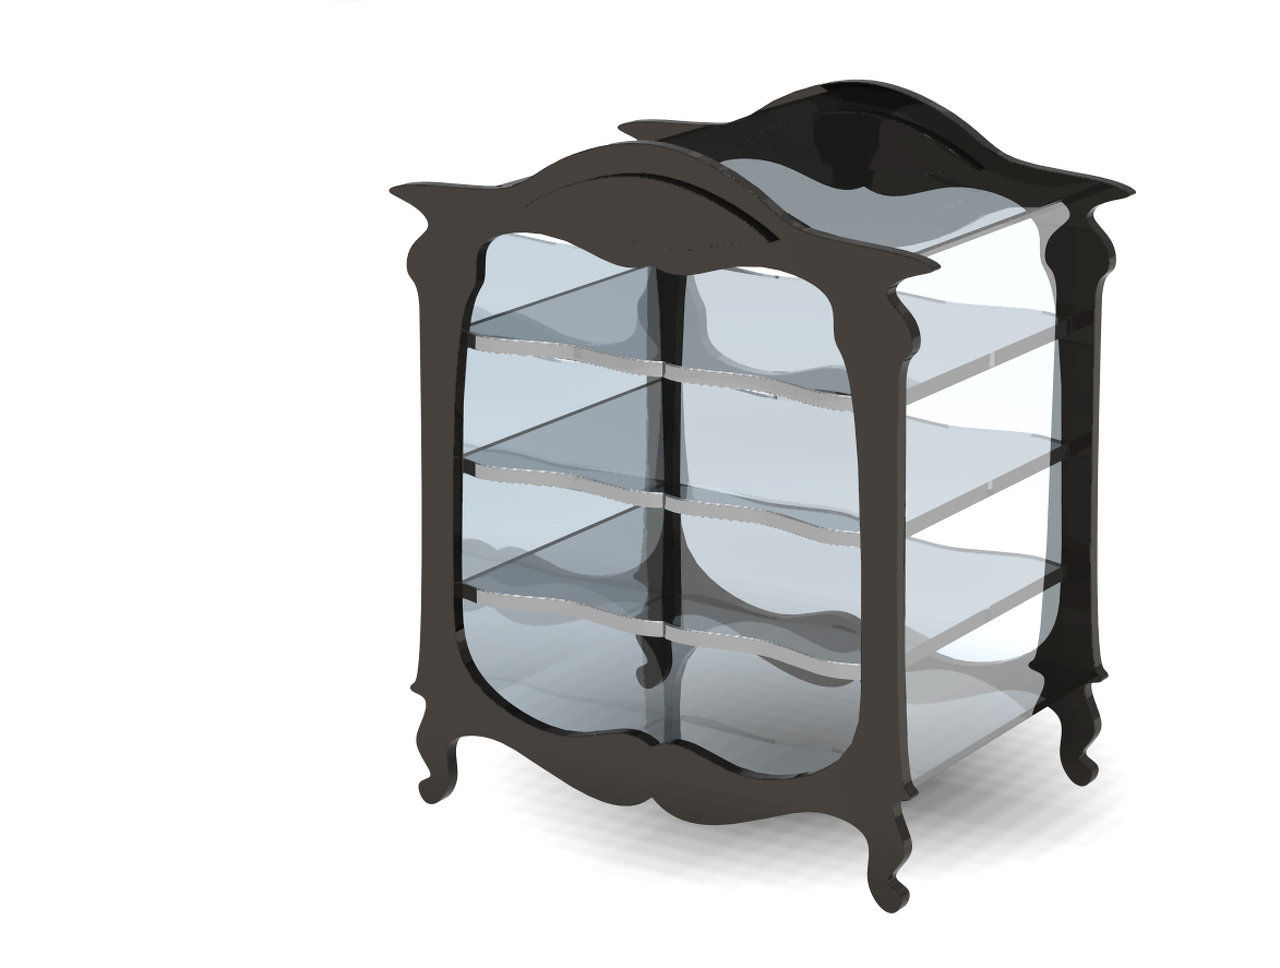 Make fabulous bespoke products contact us for Bespoke canape trays